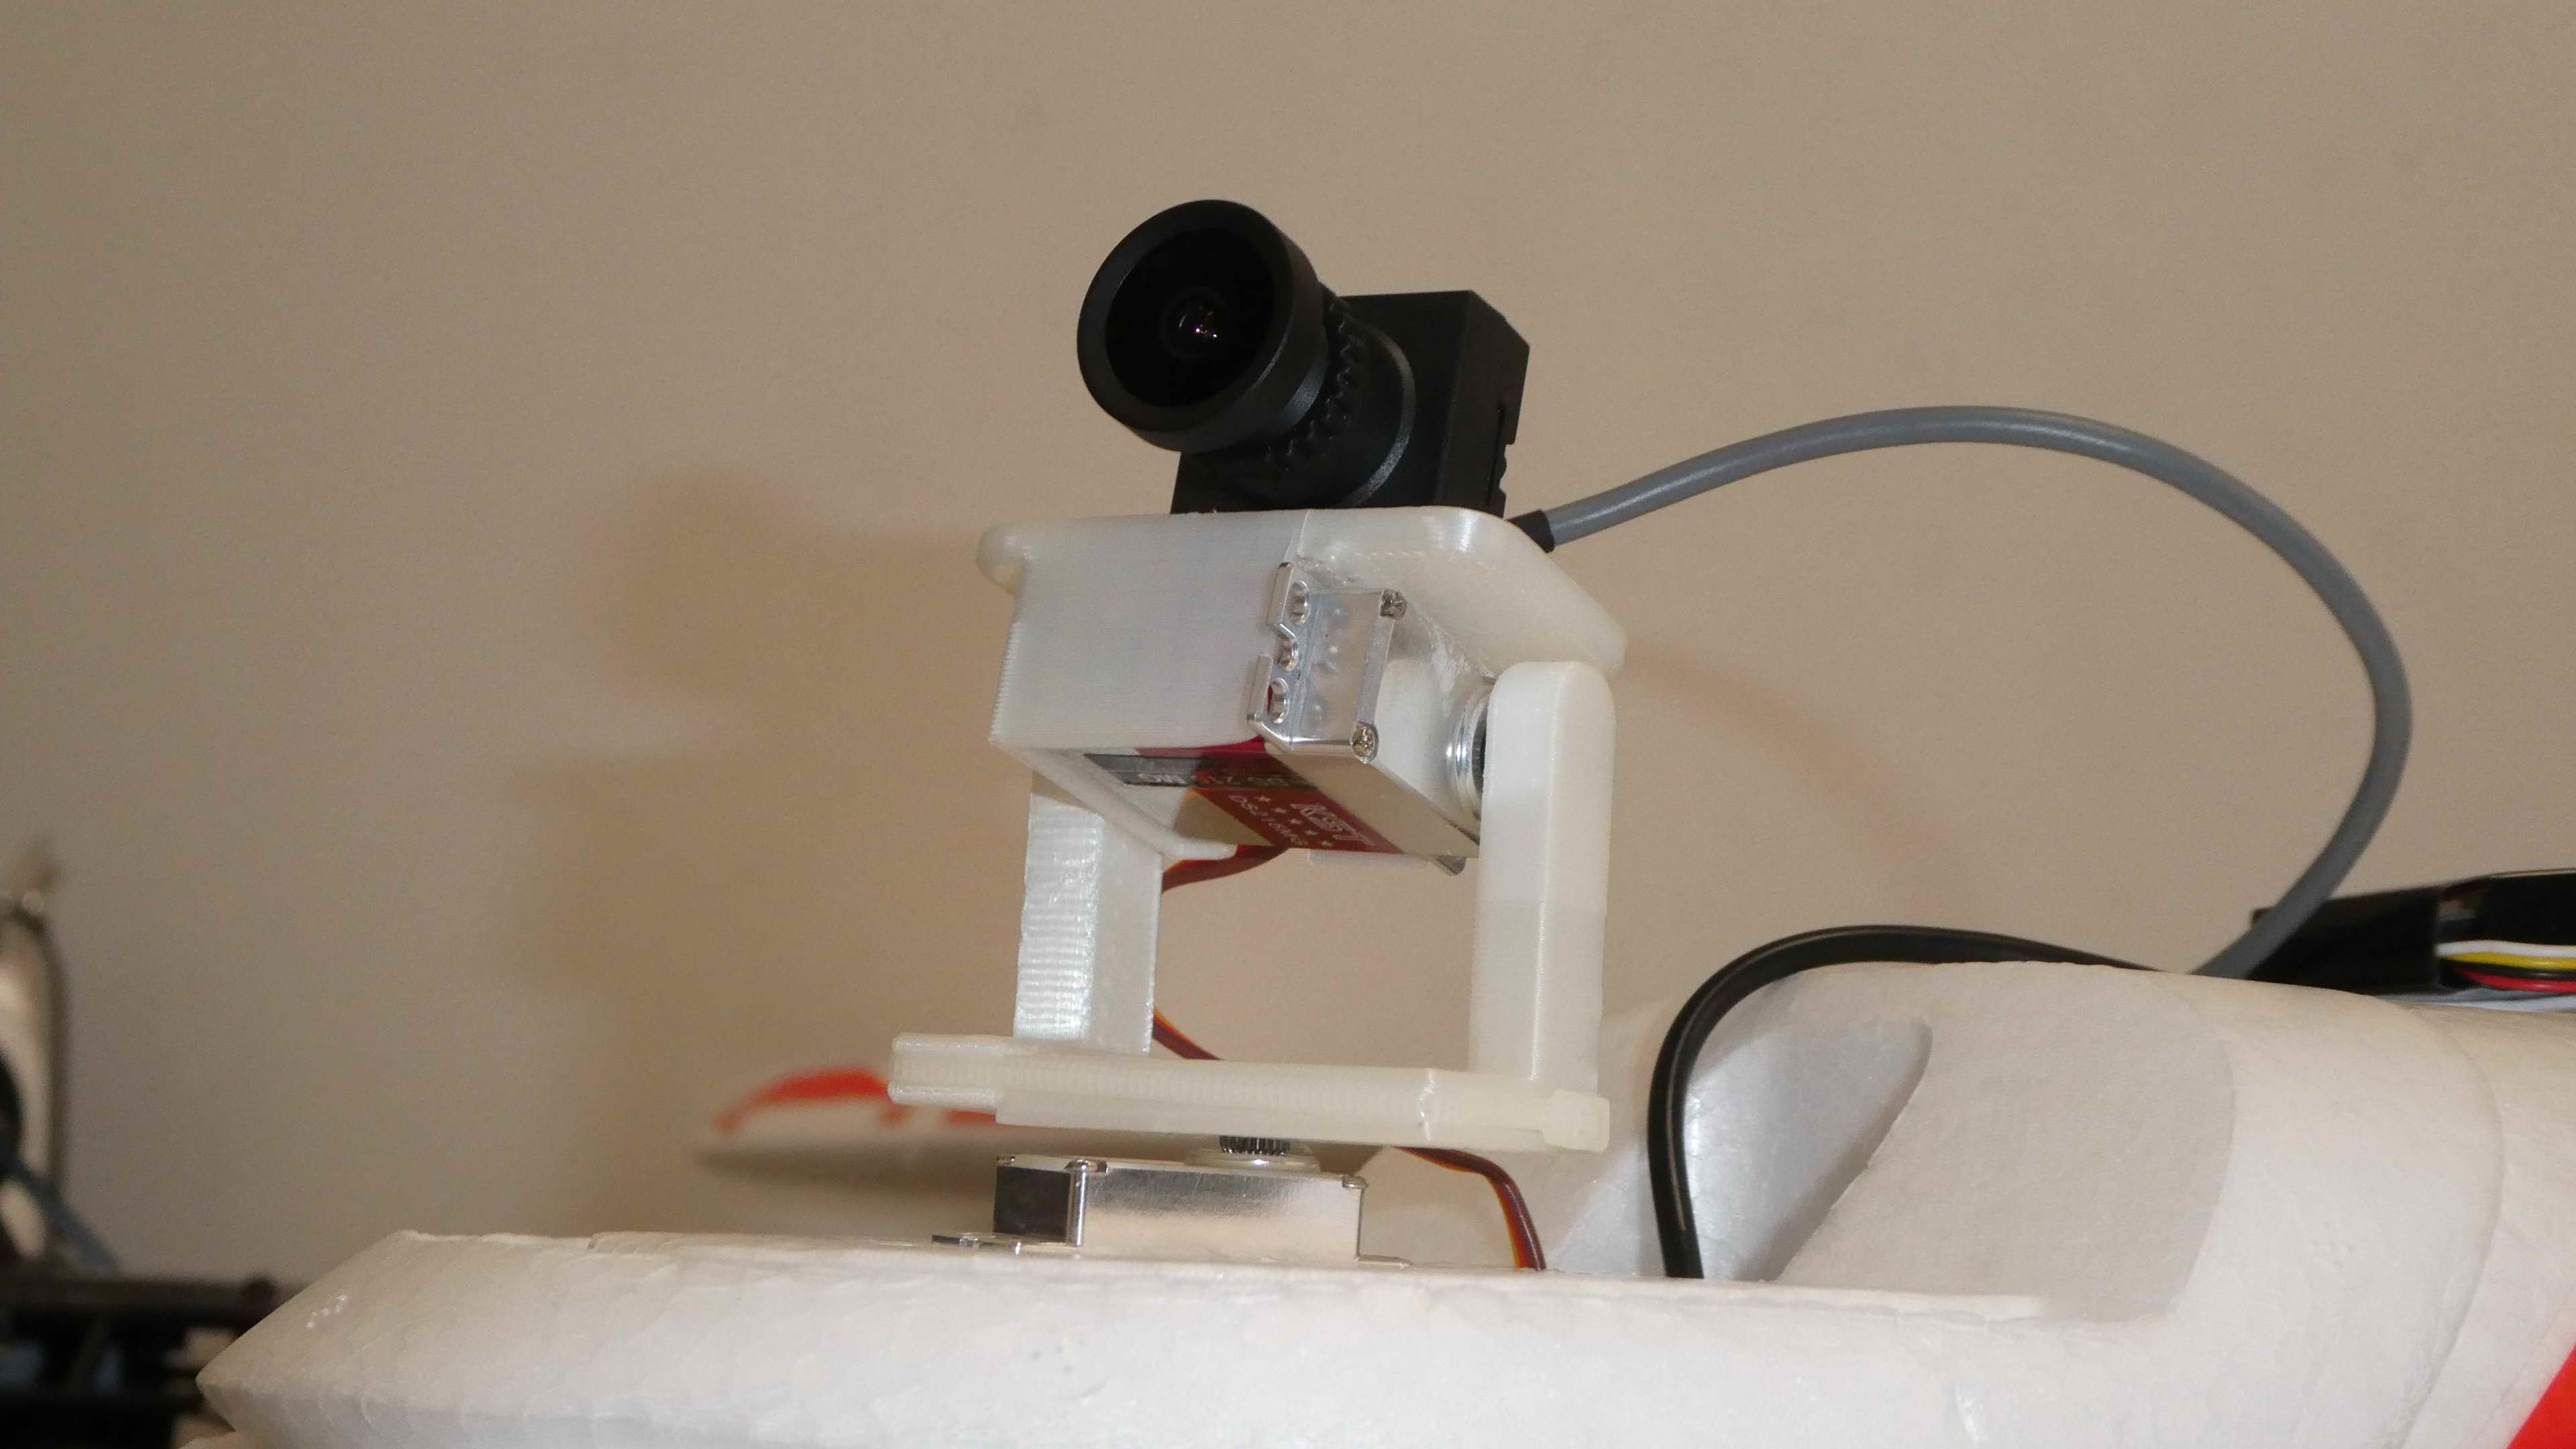 P1010027.jpg Download STL file FPV Pan Tilt Mount for FPV and HD Cameras • 3D printable template, alishanmao